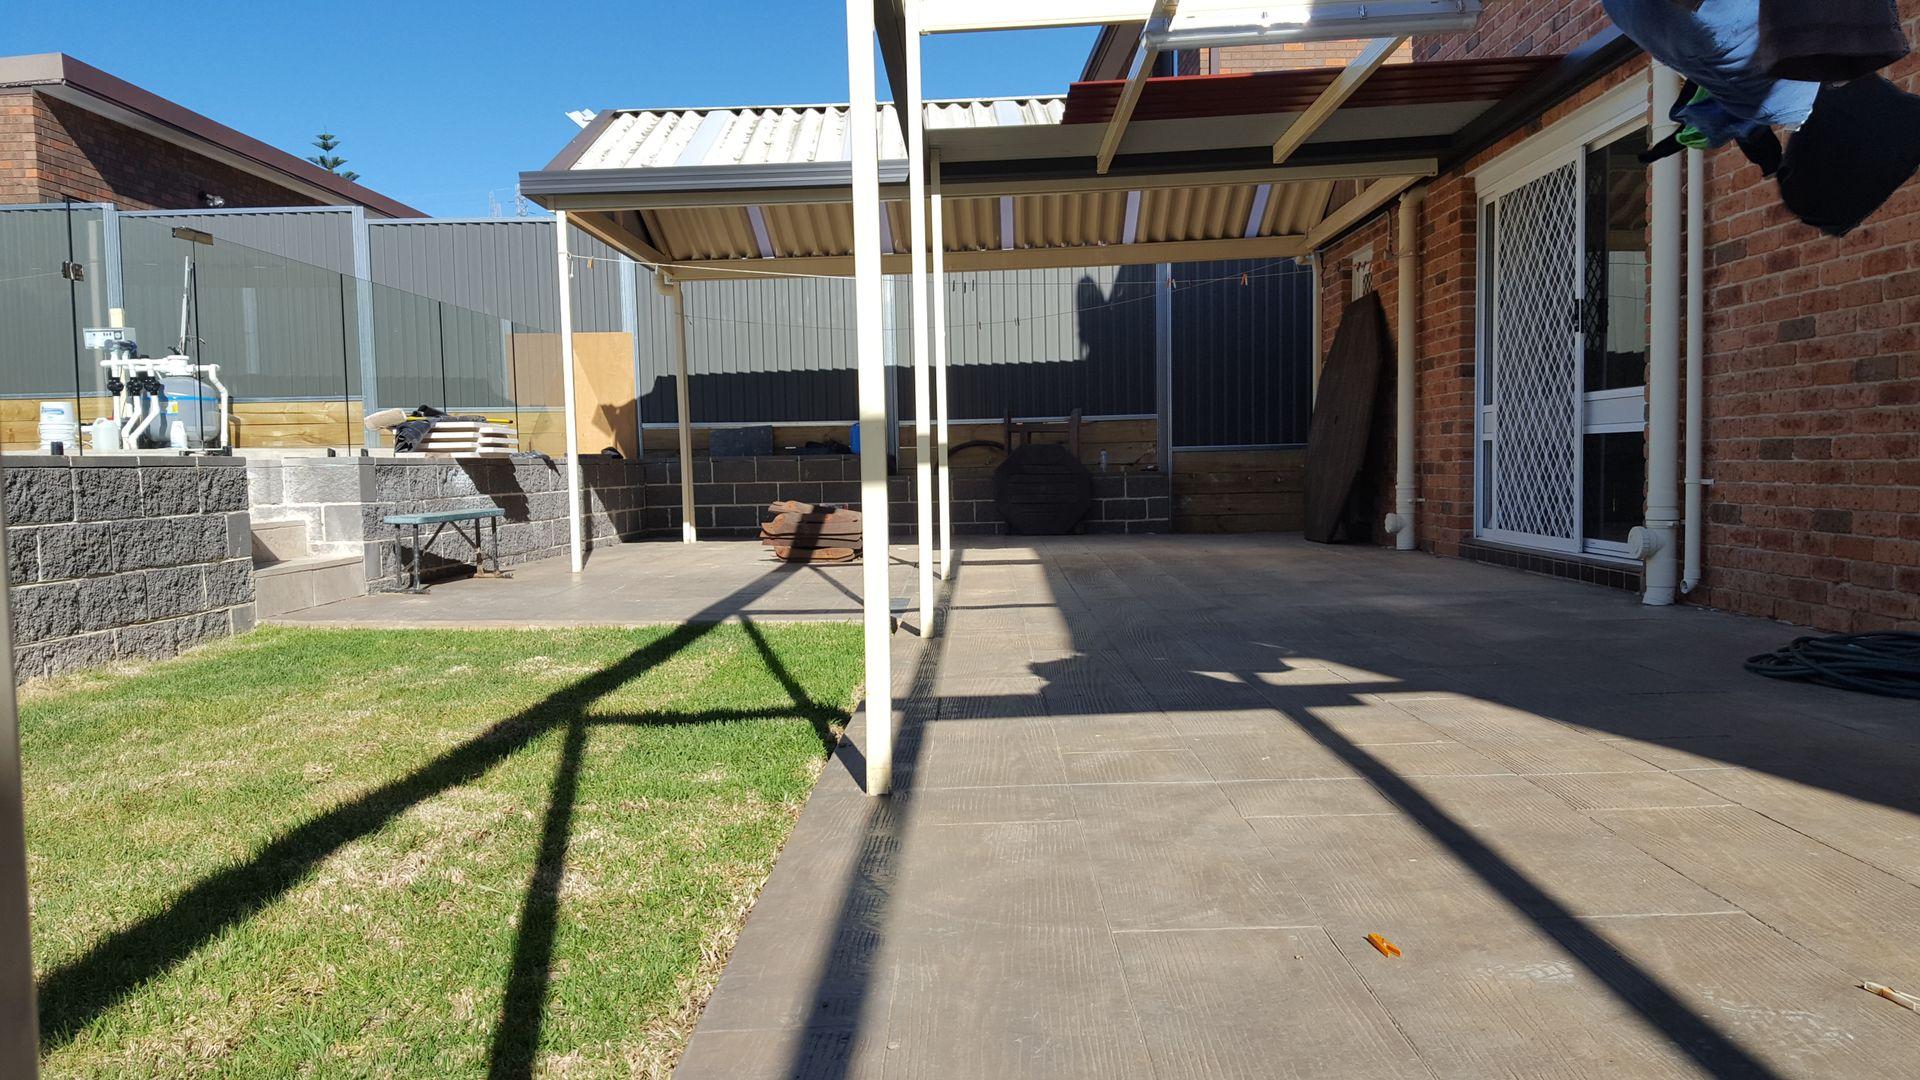 68 Begovich Crescent, Abbotsbury NSW 2176, Image 4